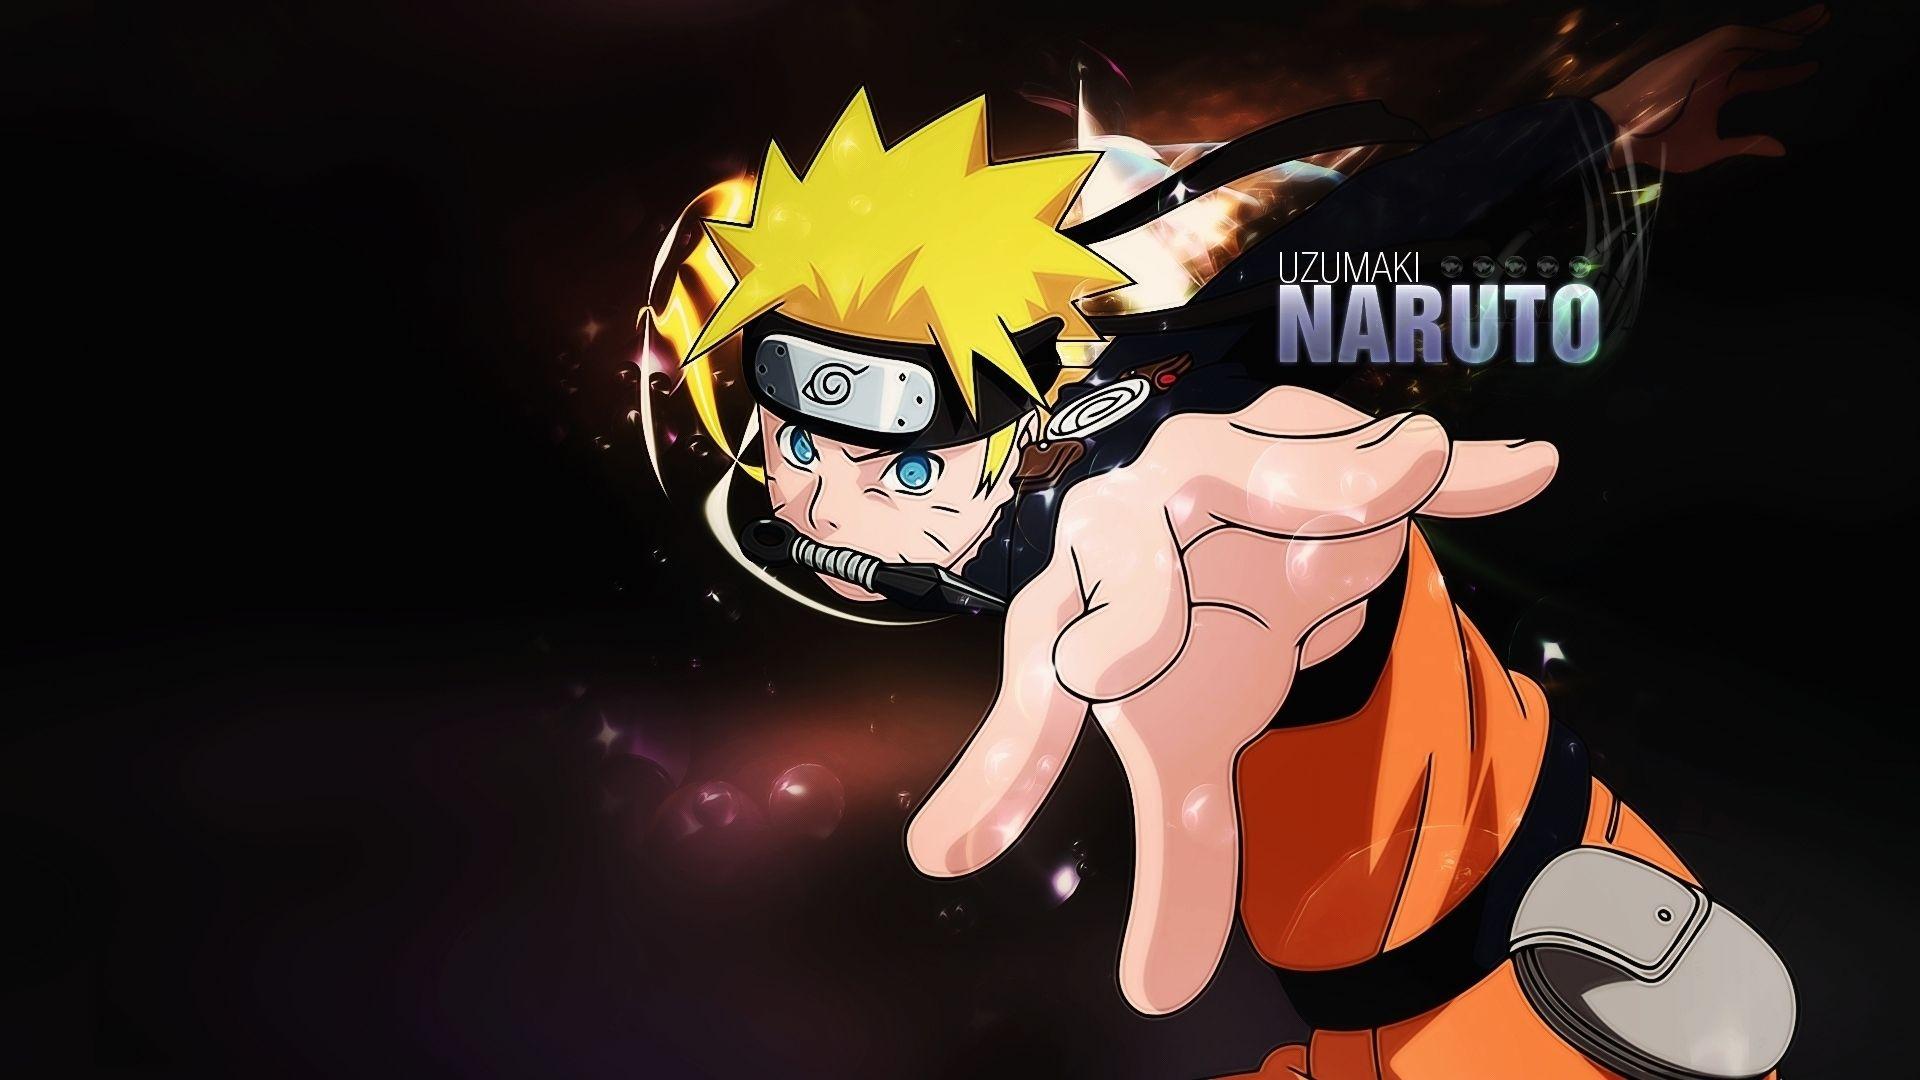 Naruto, PC Wallpaper